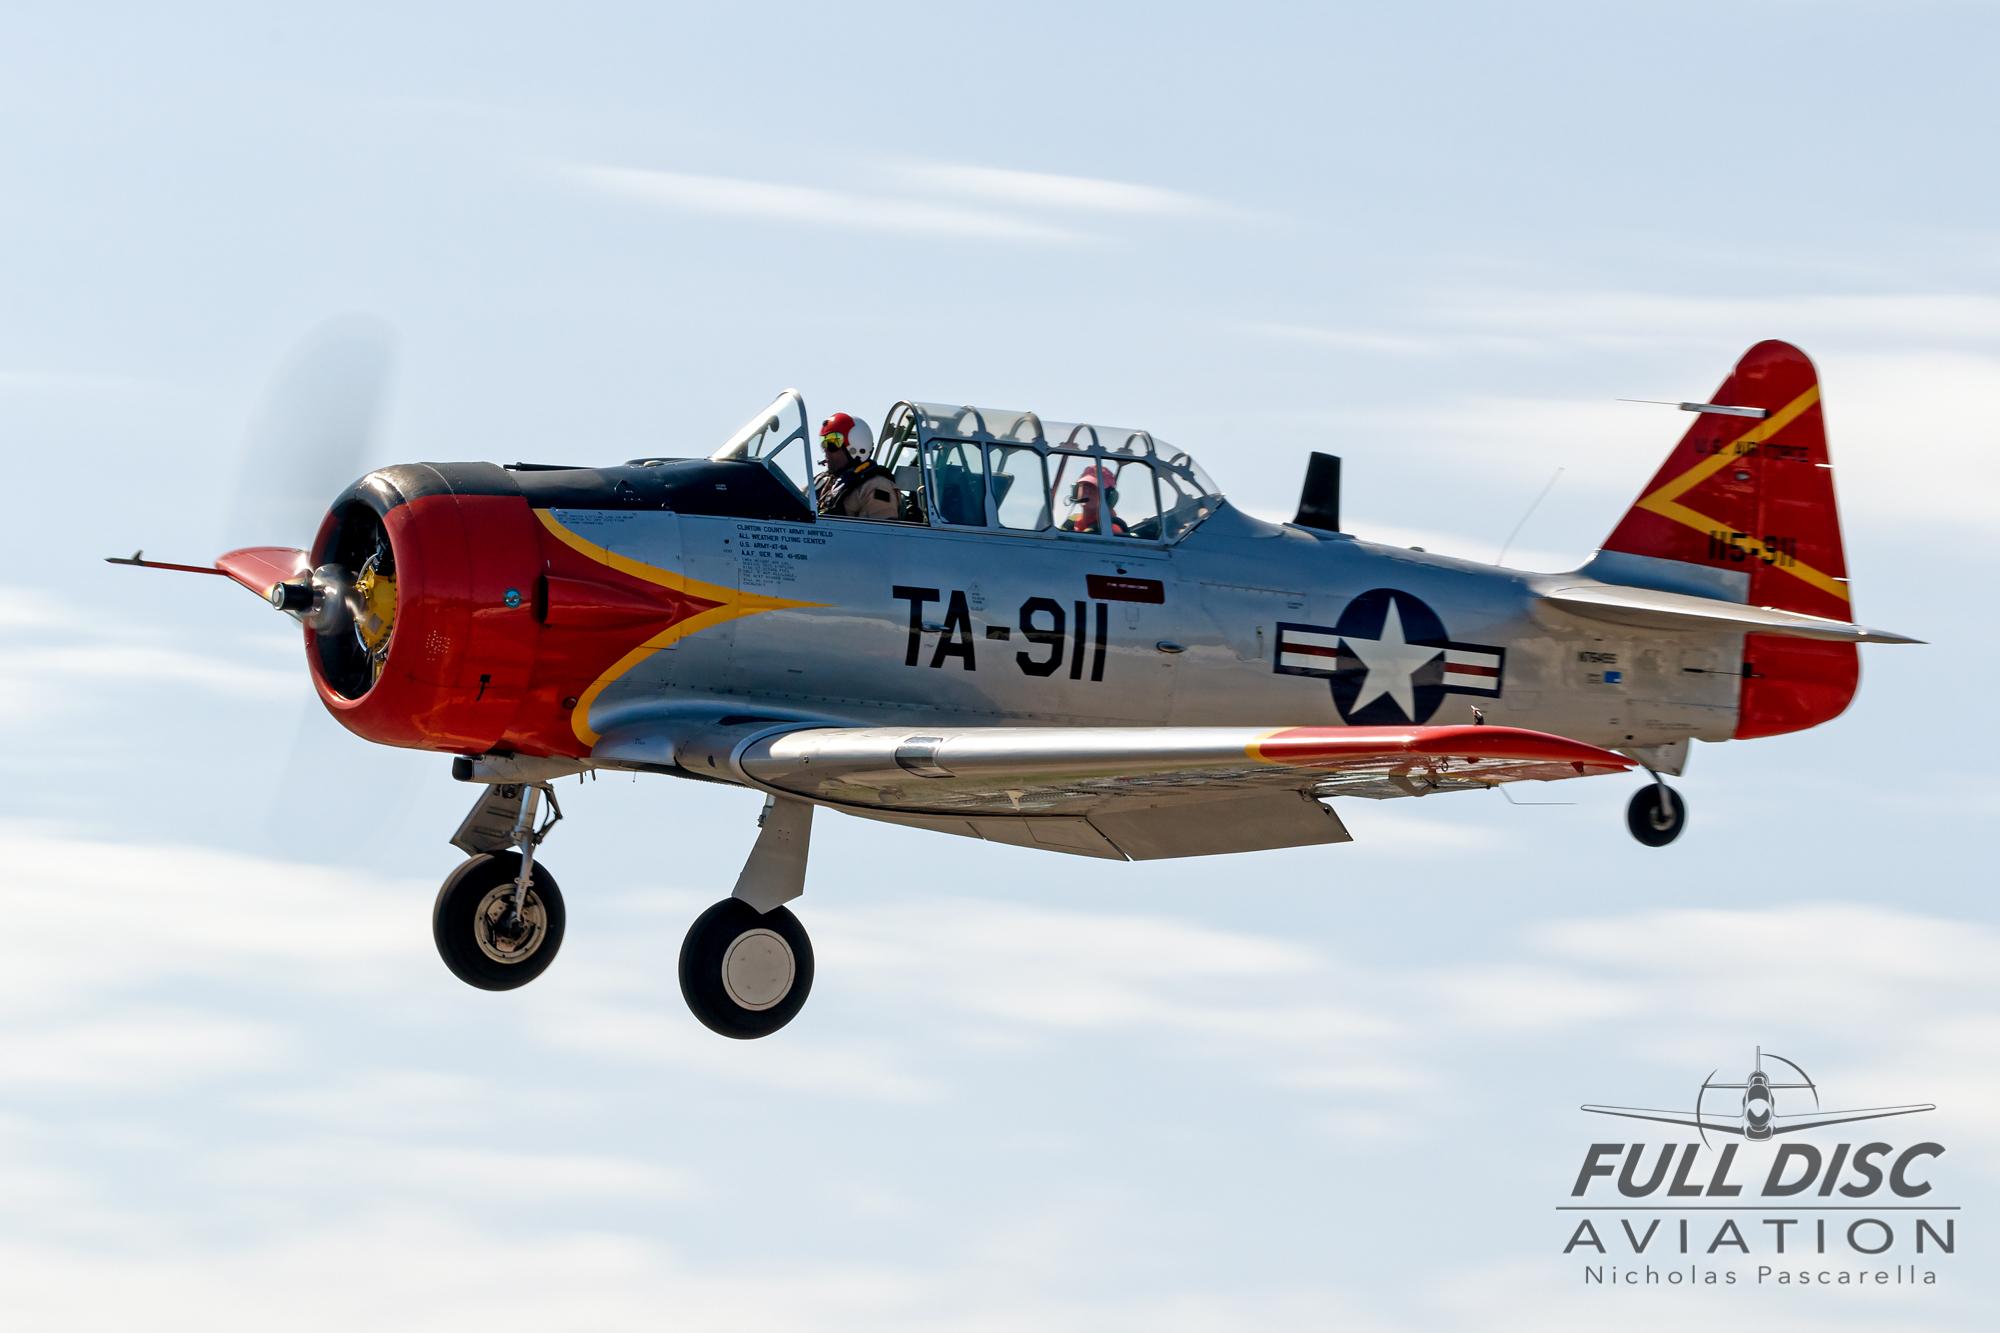 americanairpowermuseum_nicholaspascarella_nickpascarella_fulldiscaviation_legendsofairpower2019_aviation_warbird_t6_texan_landing_red.jpg